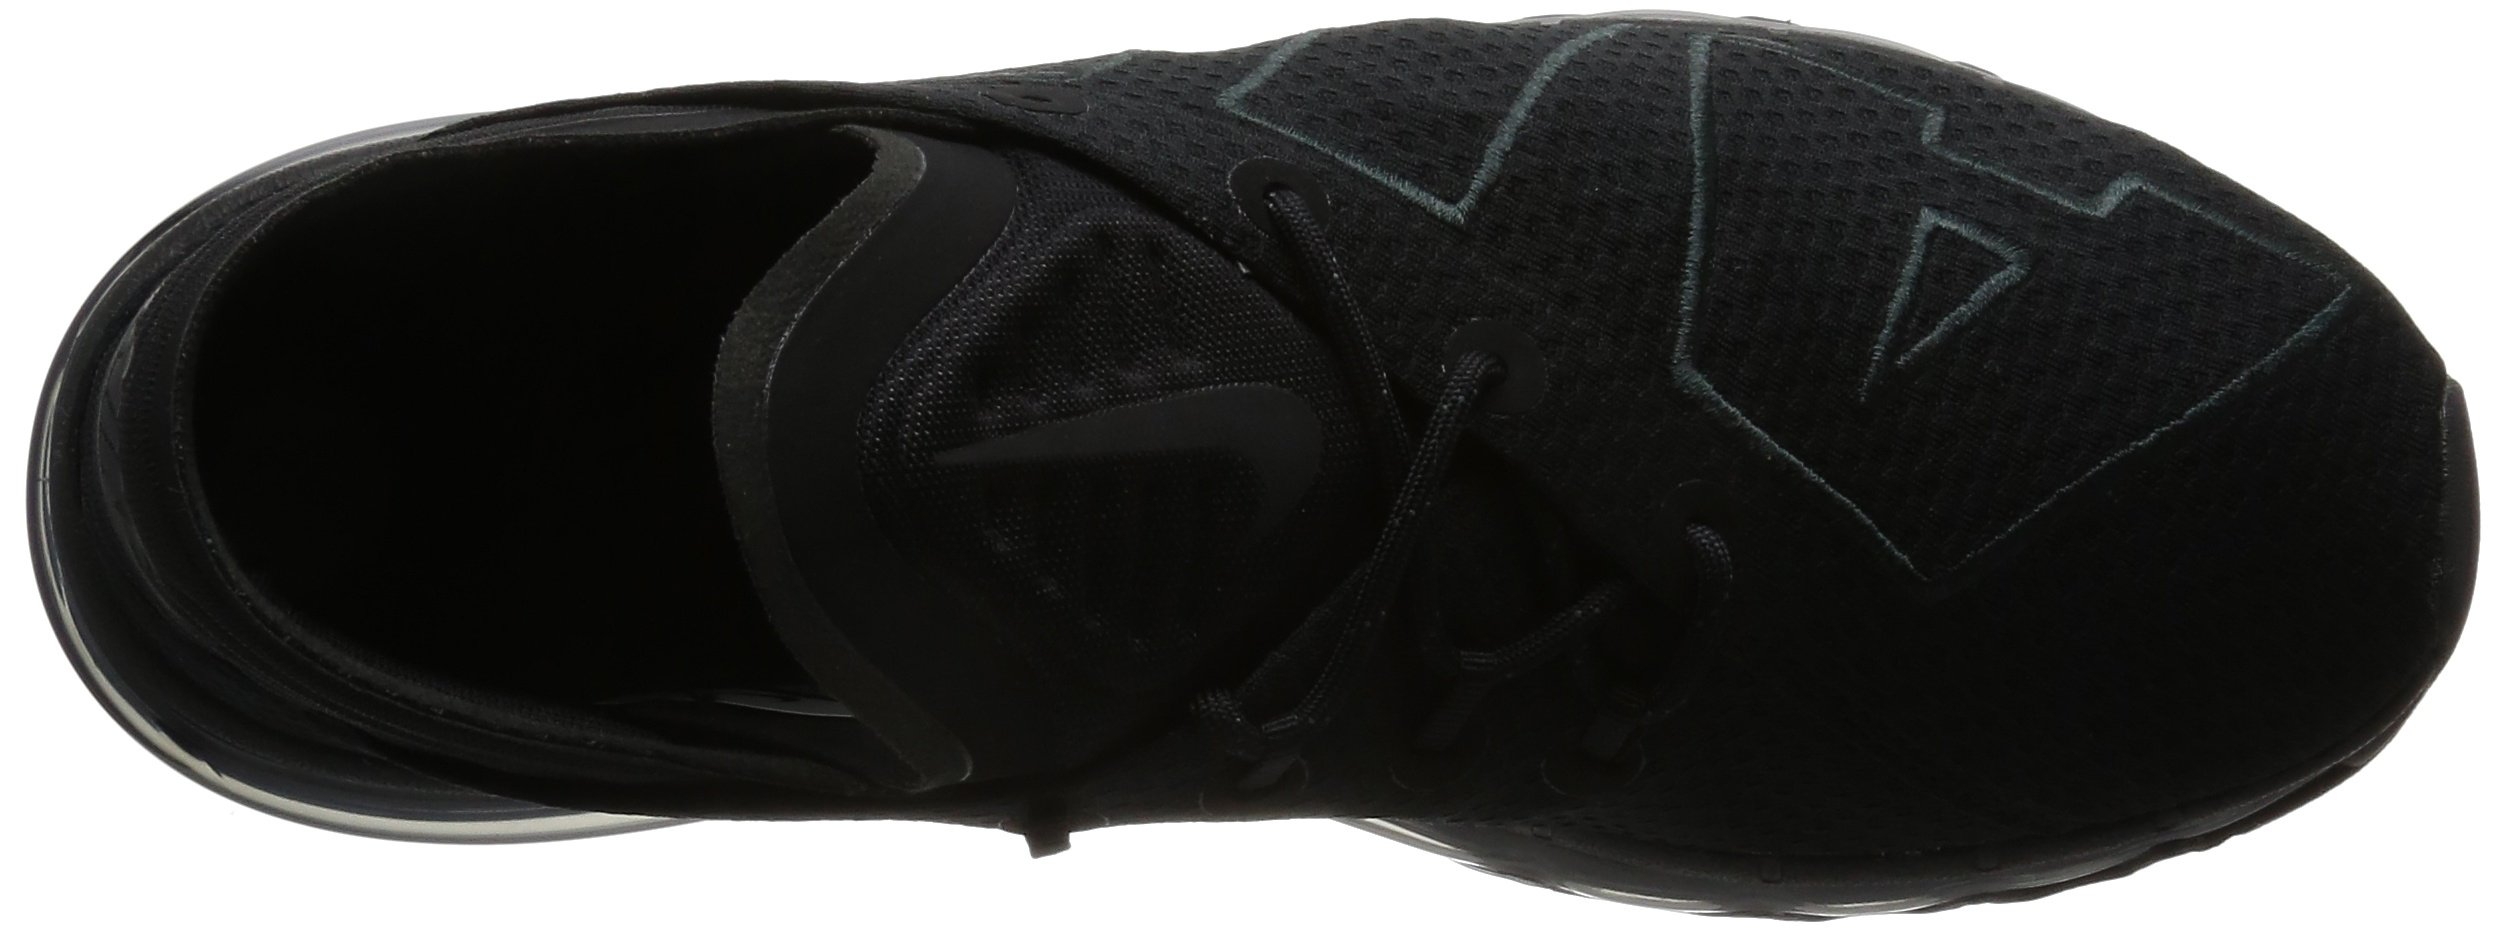 Nike Men's Air Max Flair, Black/ANTHRACIE, 10 M US by Nike (Image #7)